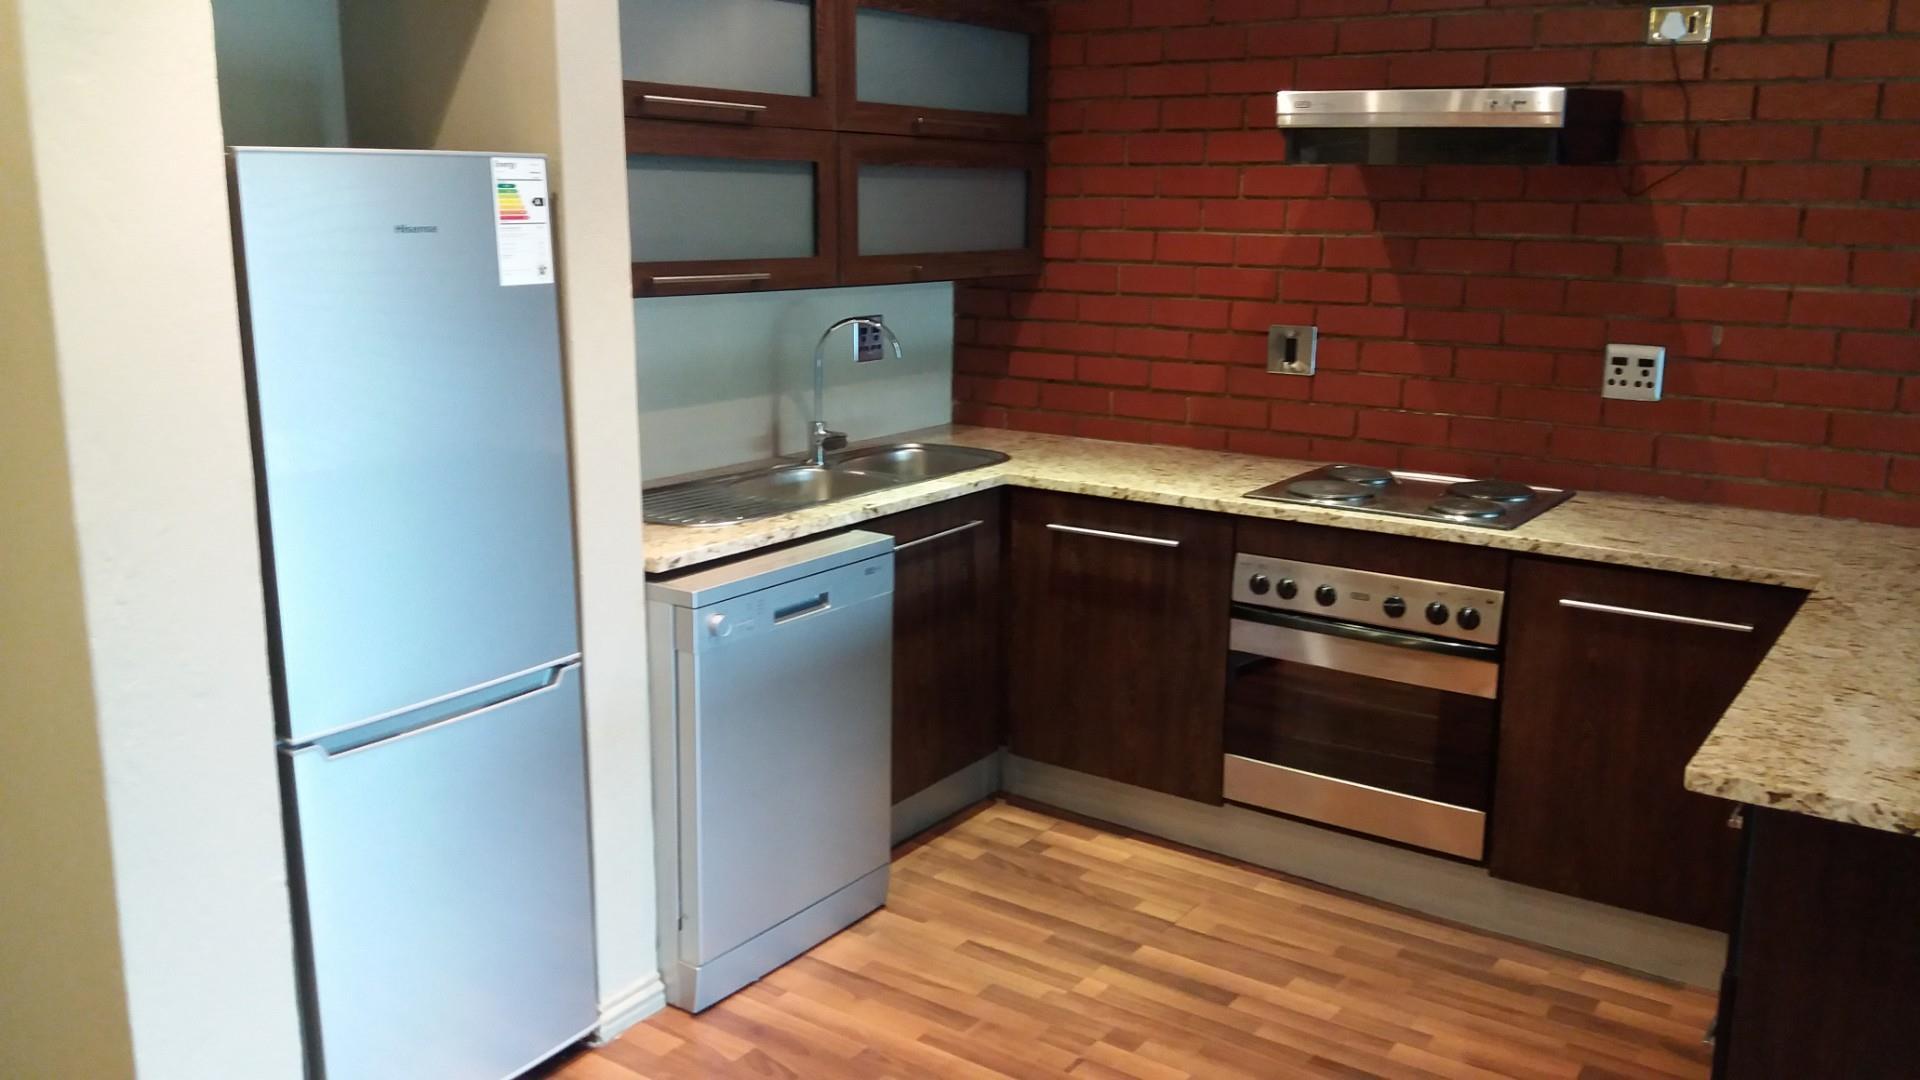 1 Bedroom Apartment / Flat For Sale in Braamfontein